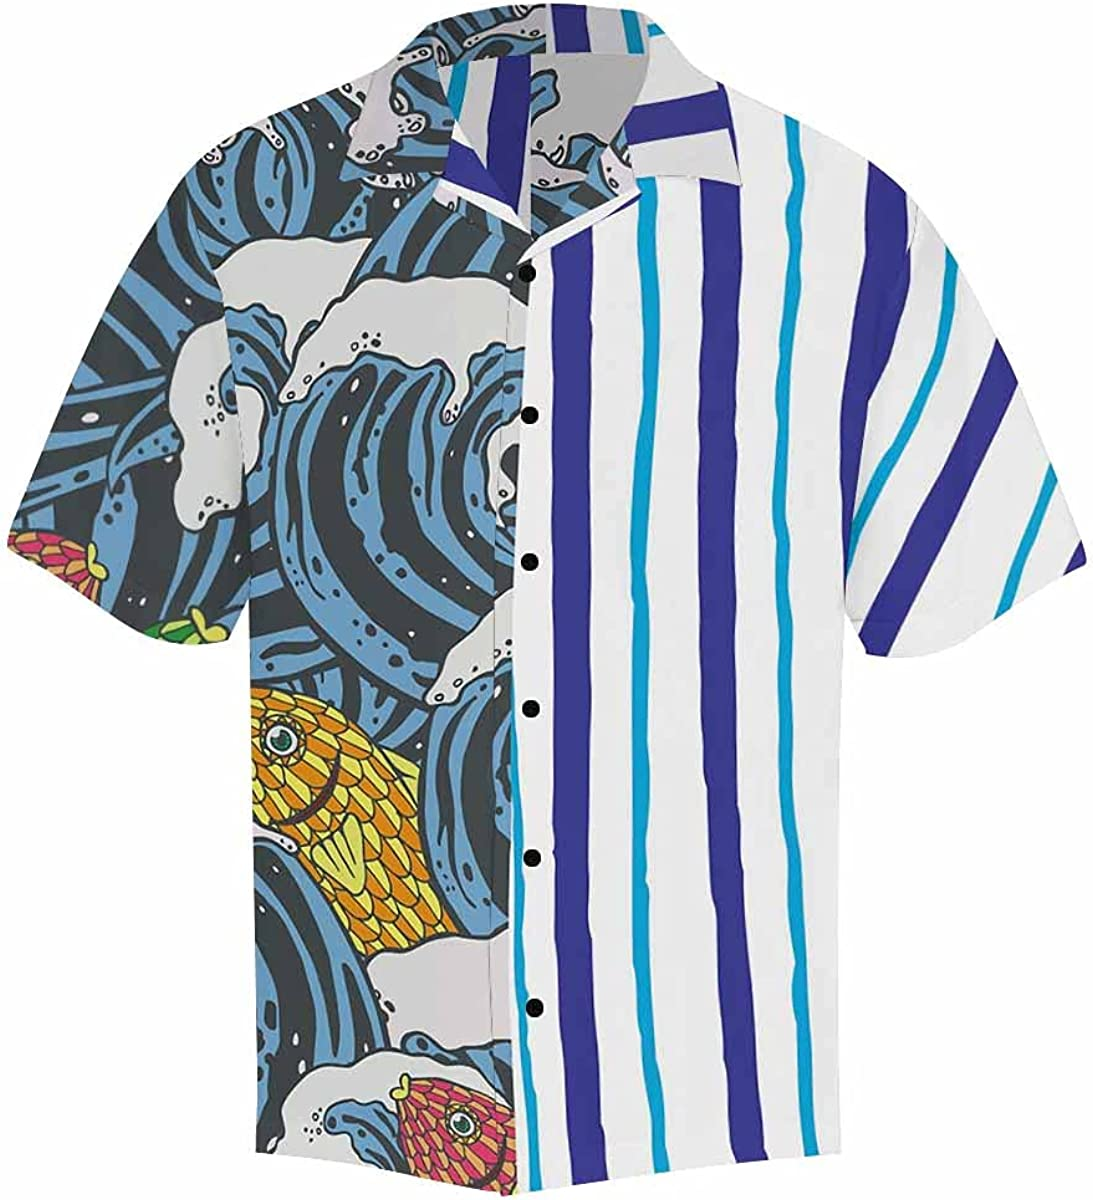 InterestPrint Men's Casual Button Down Popular popular Vintage Short Surprise price Skul Sleeve